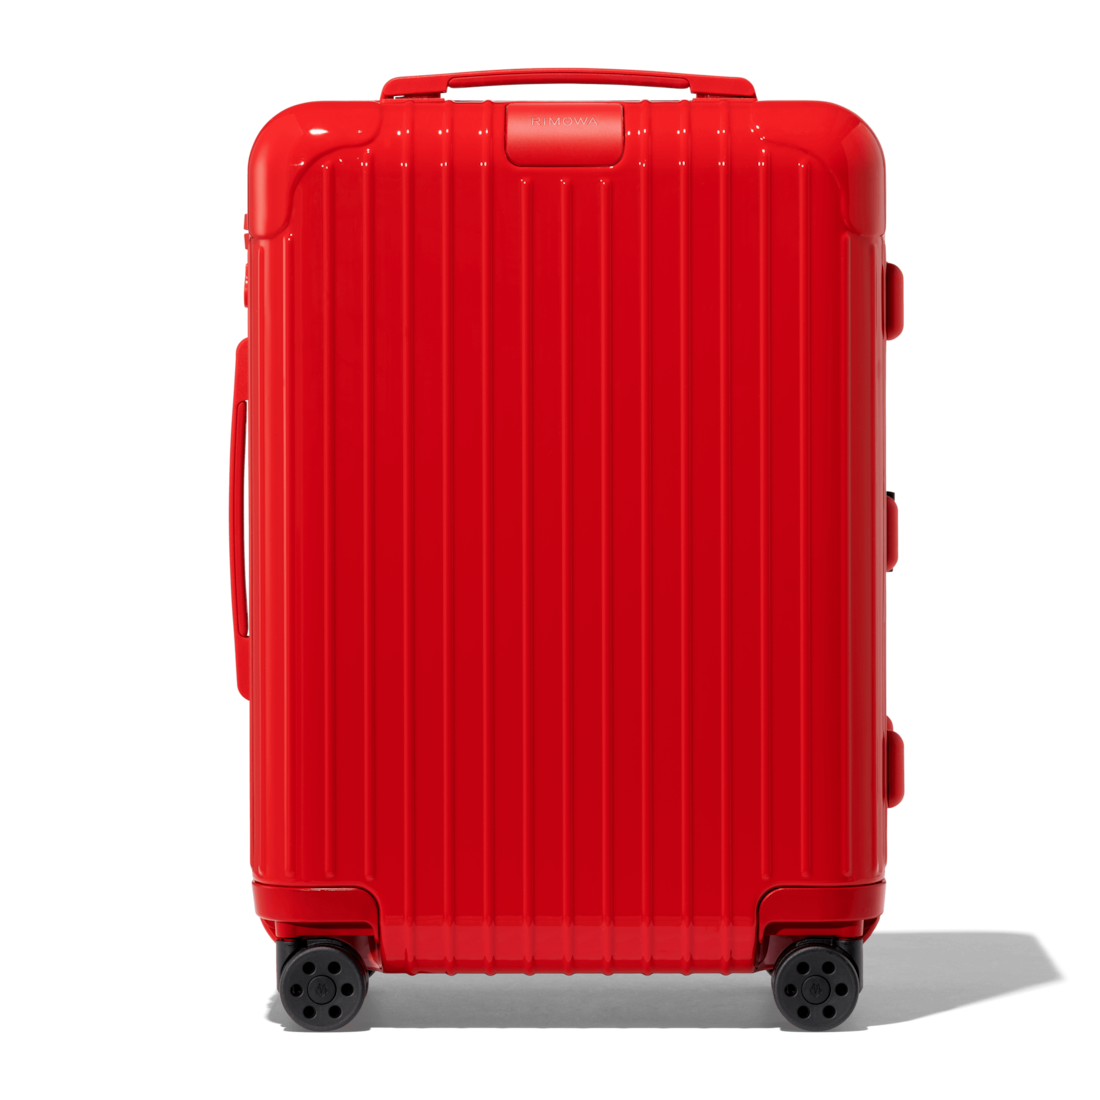 RIMOWA(リモワ)おすすめのスーツケース1